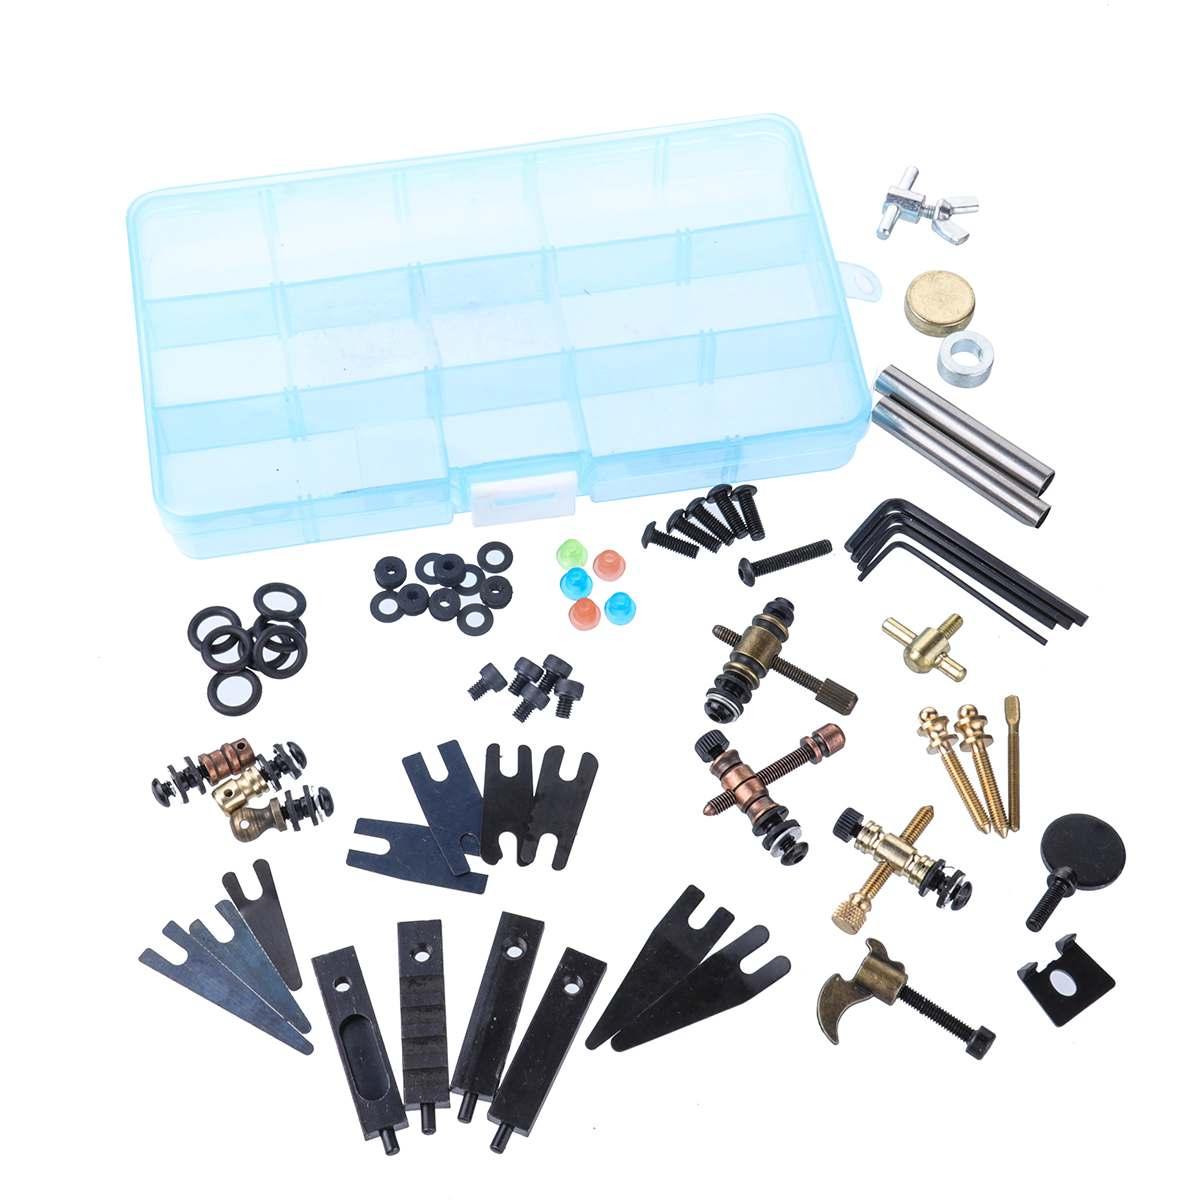 DIY Tattoo Accessories Parts Screws Kit Tattoo Guns Machine Repair Tools Maintenance Tools Set Assortment Storage Box Supplies